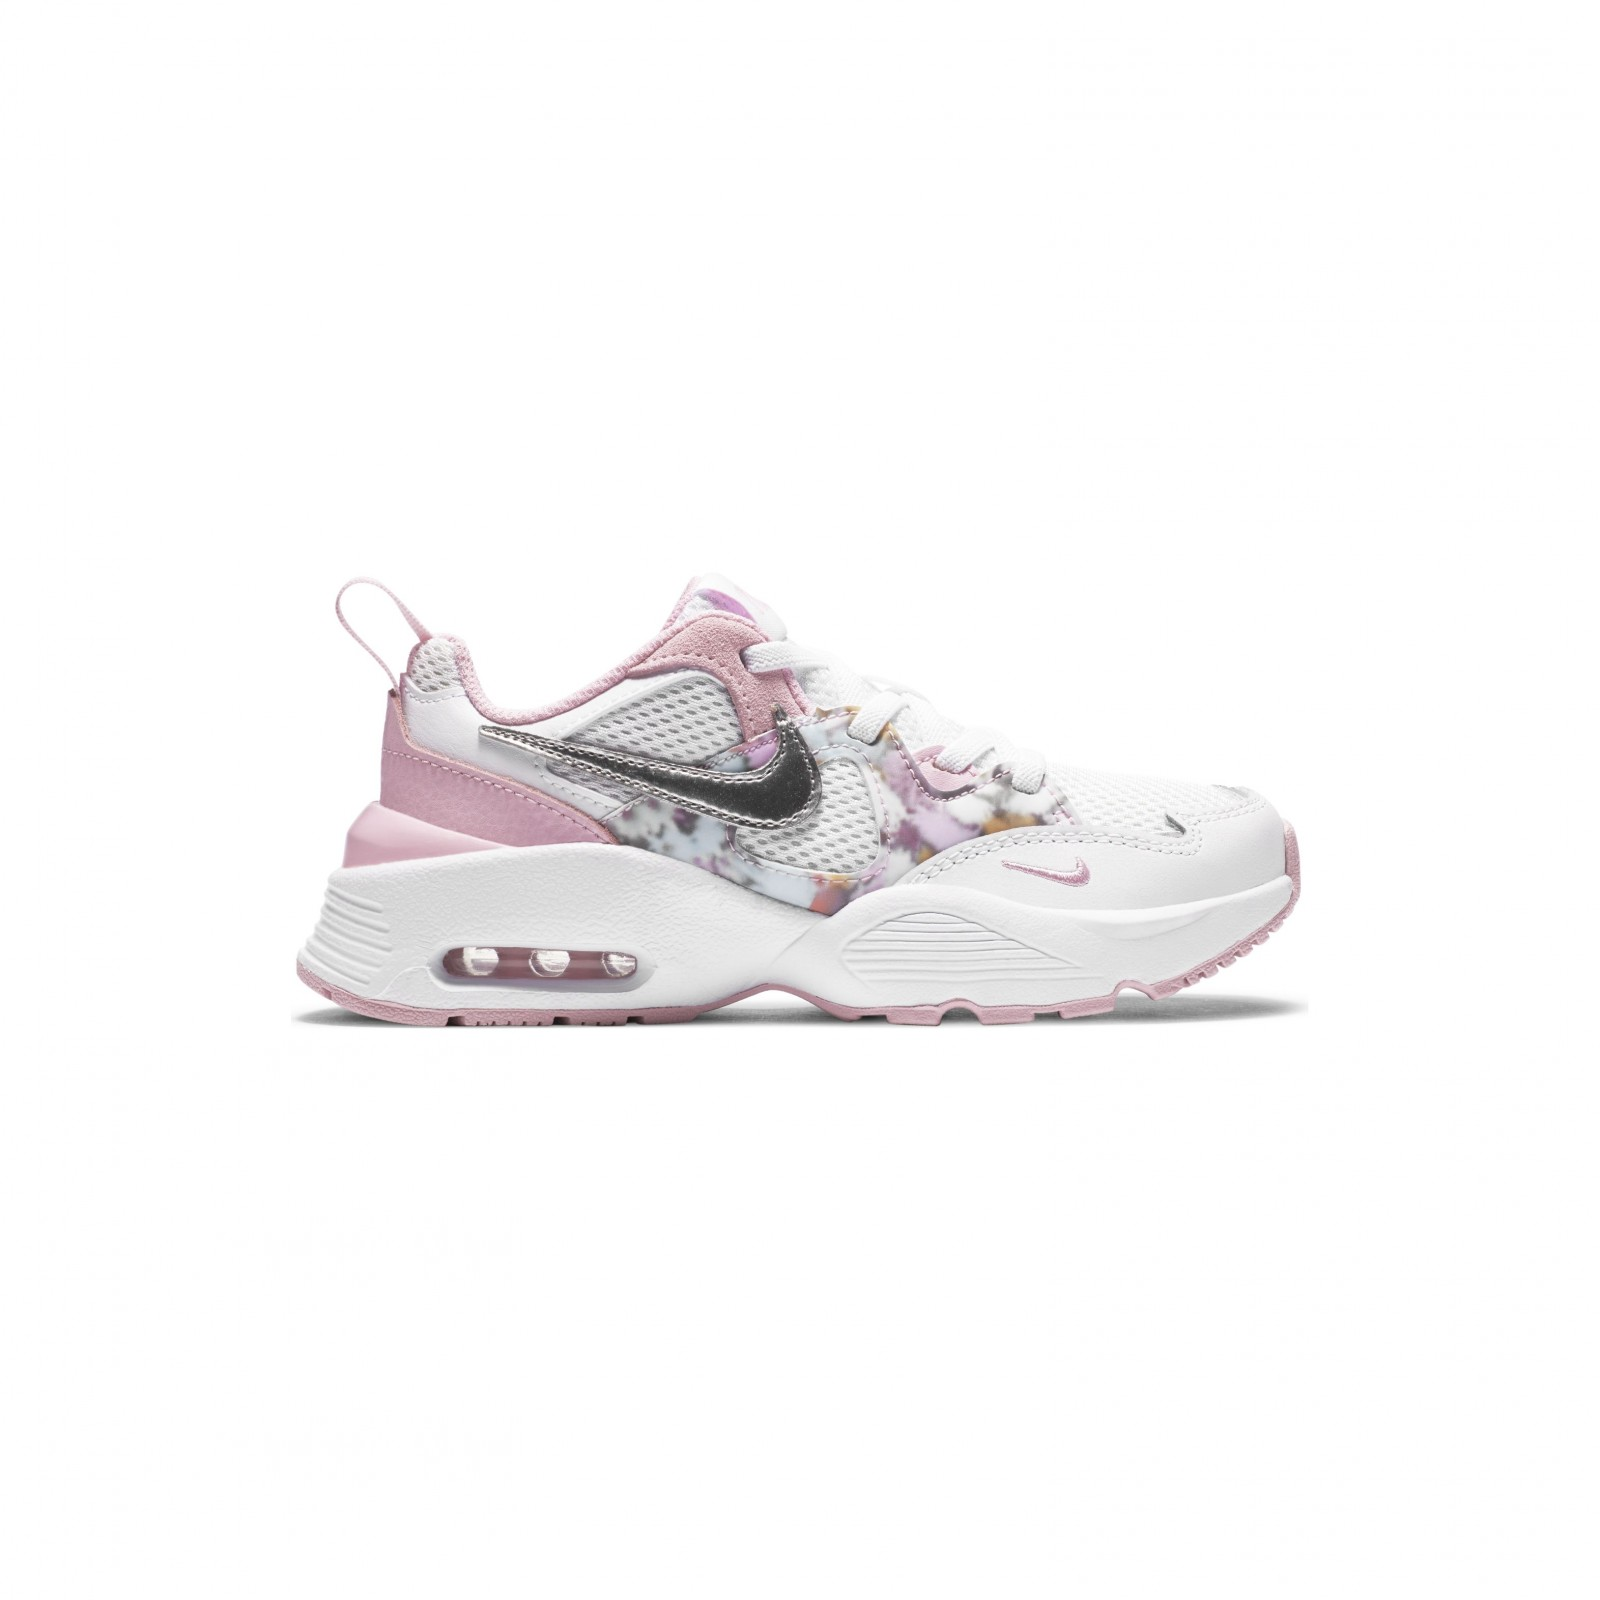 Nike air max fusion se1 (ps) WHITE/METALLIC SILVER-LT ARCTIC PINK